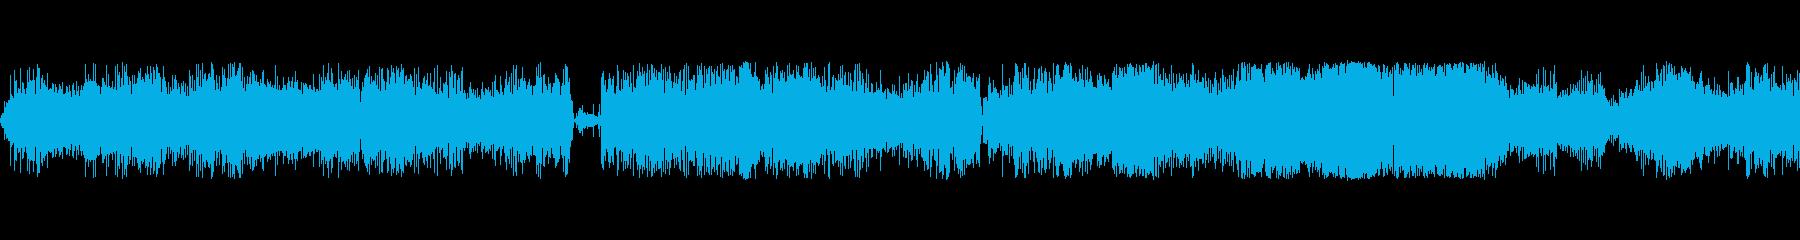 SHORTWAVE RADIO:送...の再生済みの波形